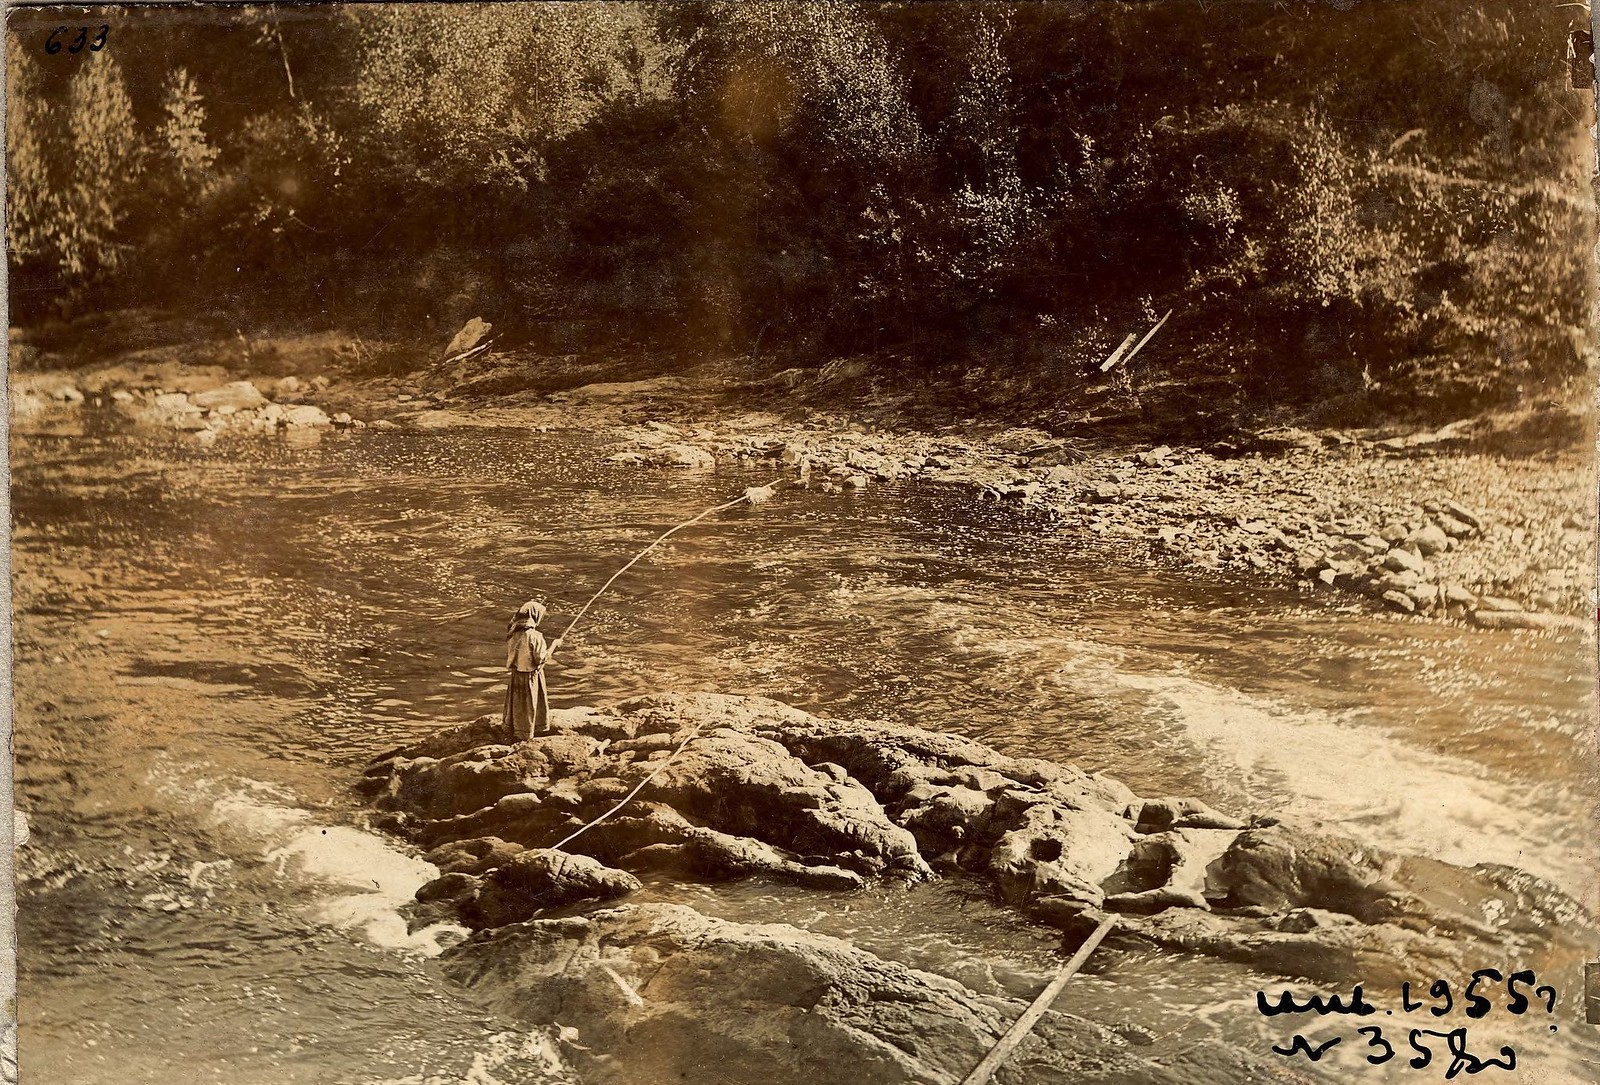 09. Река Майма - правый приток реки Катуни у села Майма.